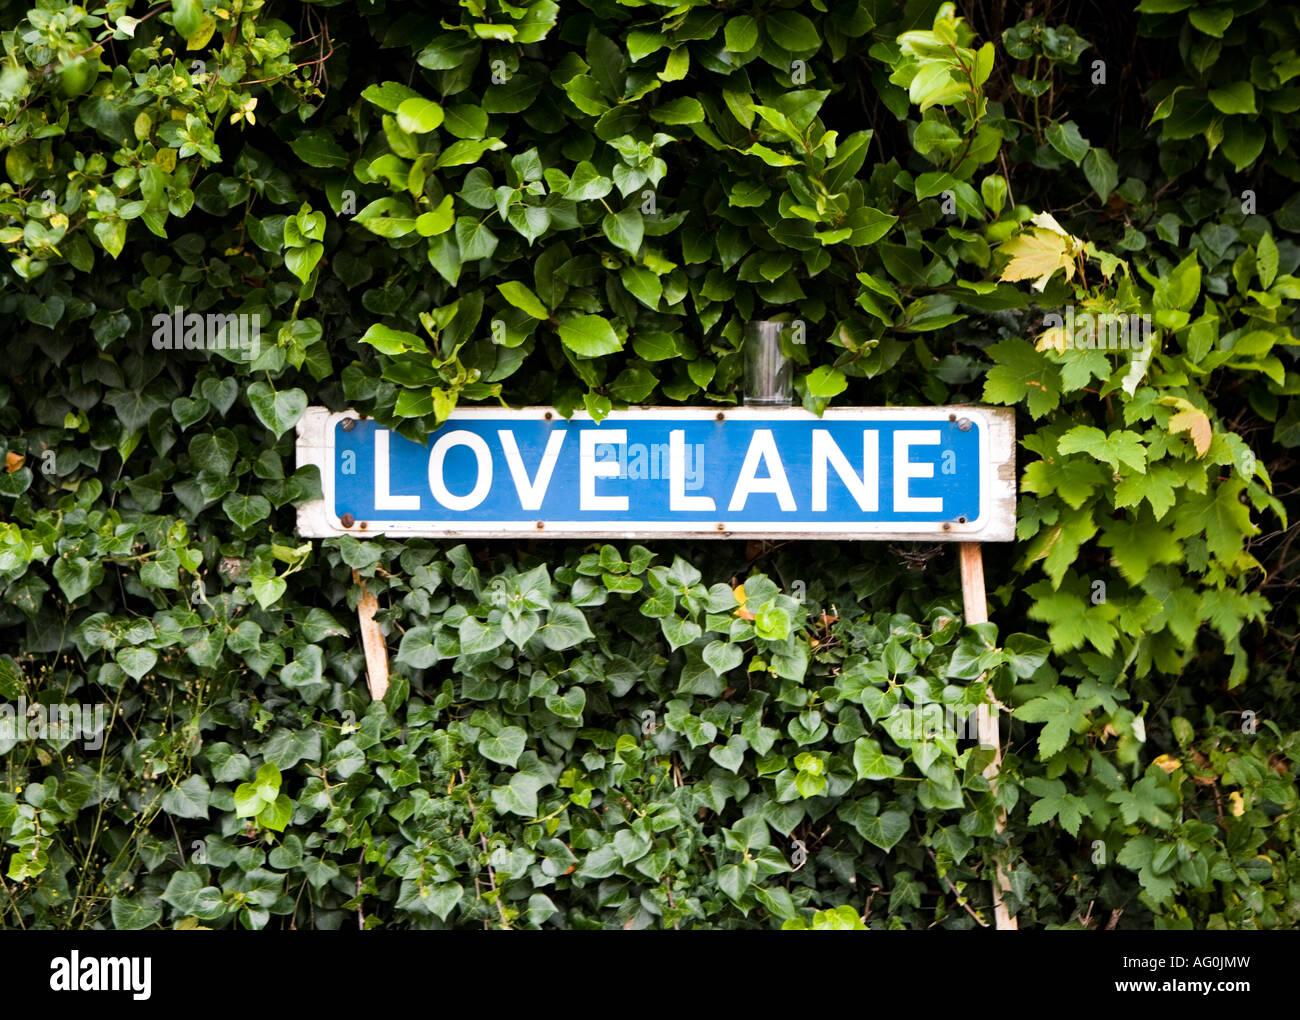 British road sign for Love Lane - Stock Image